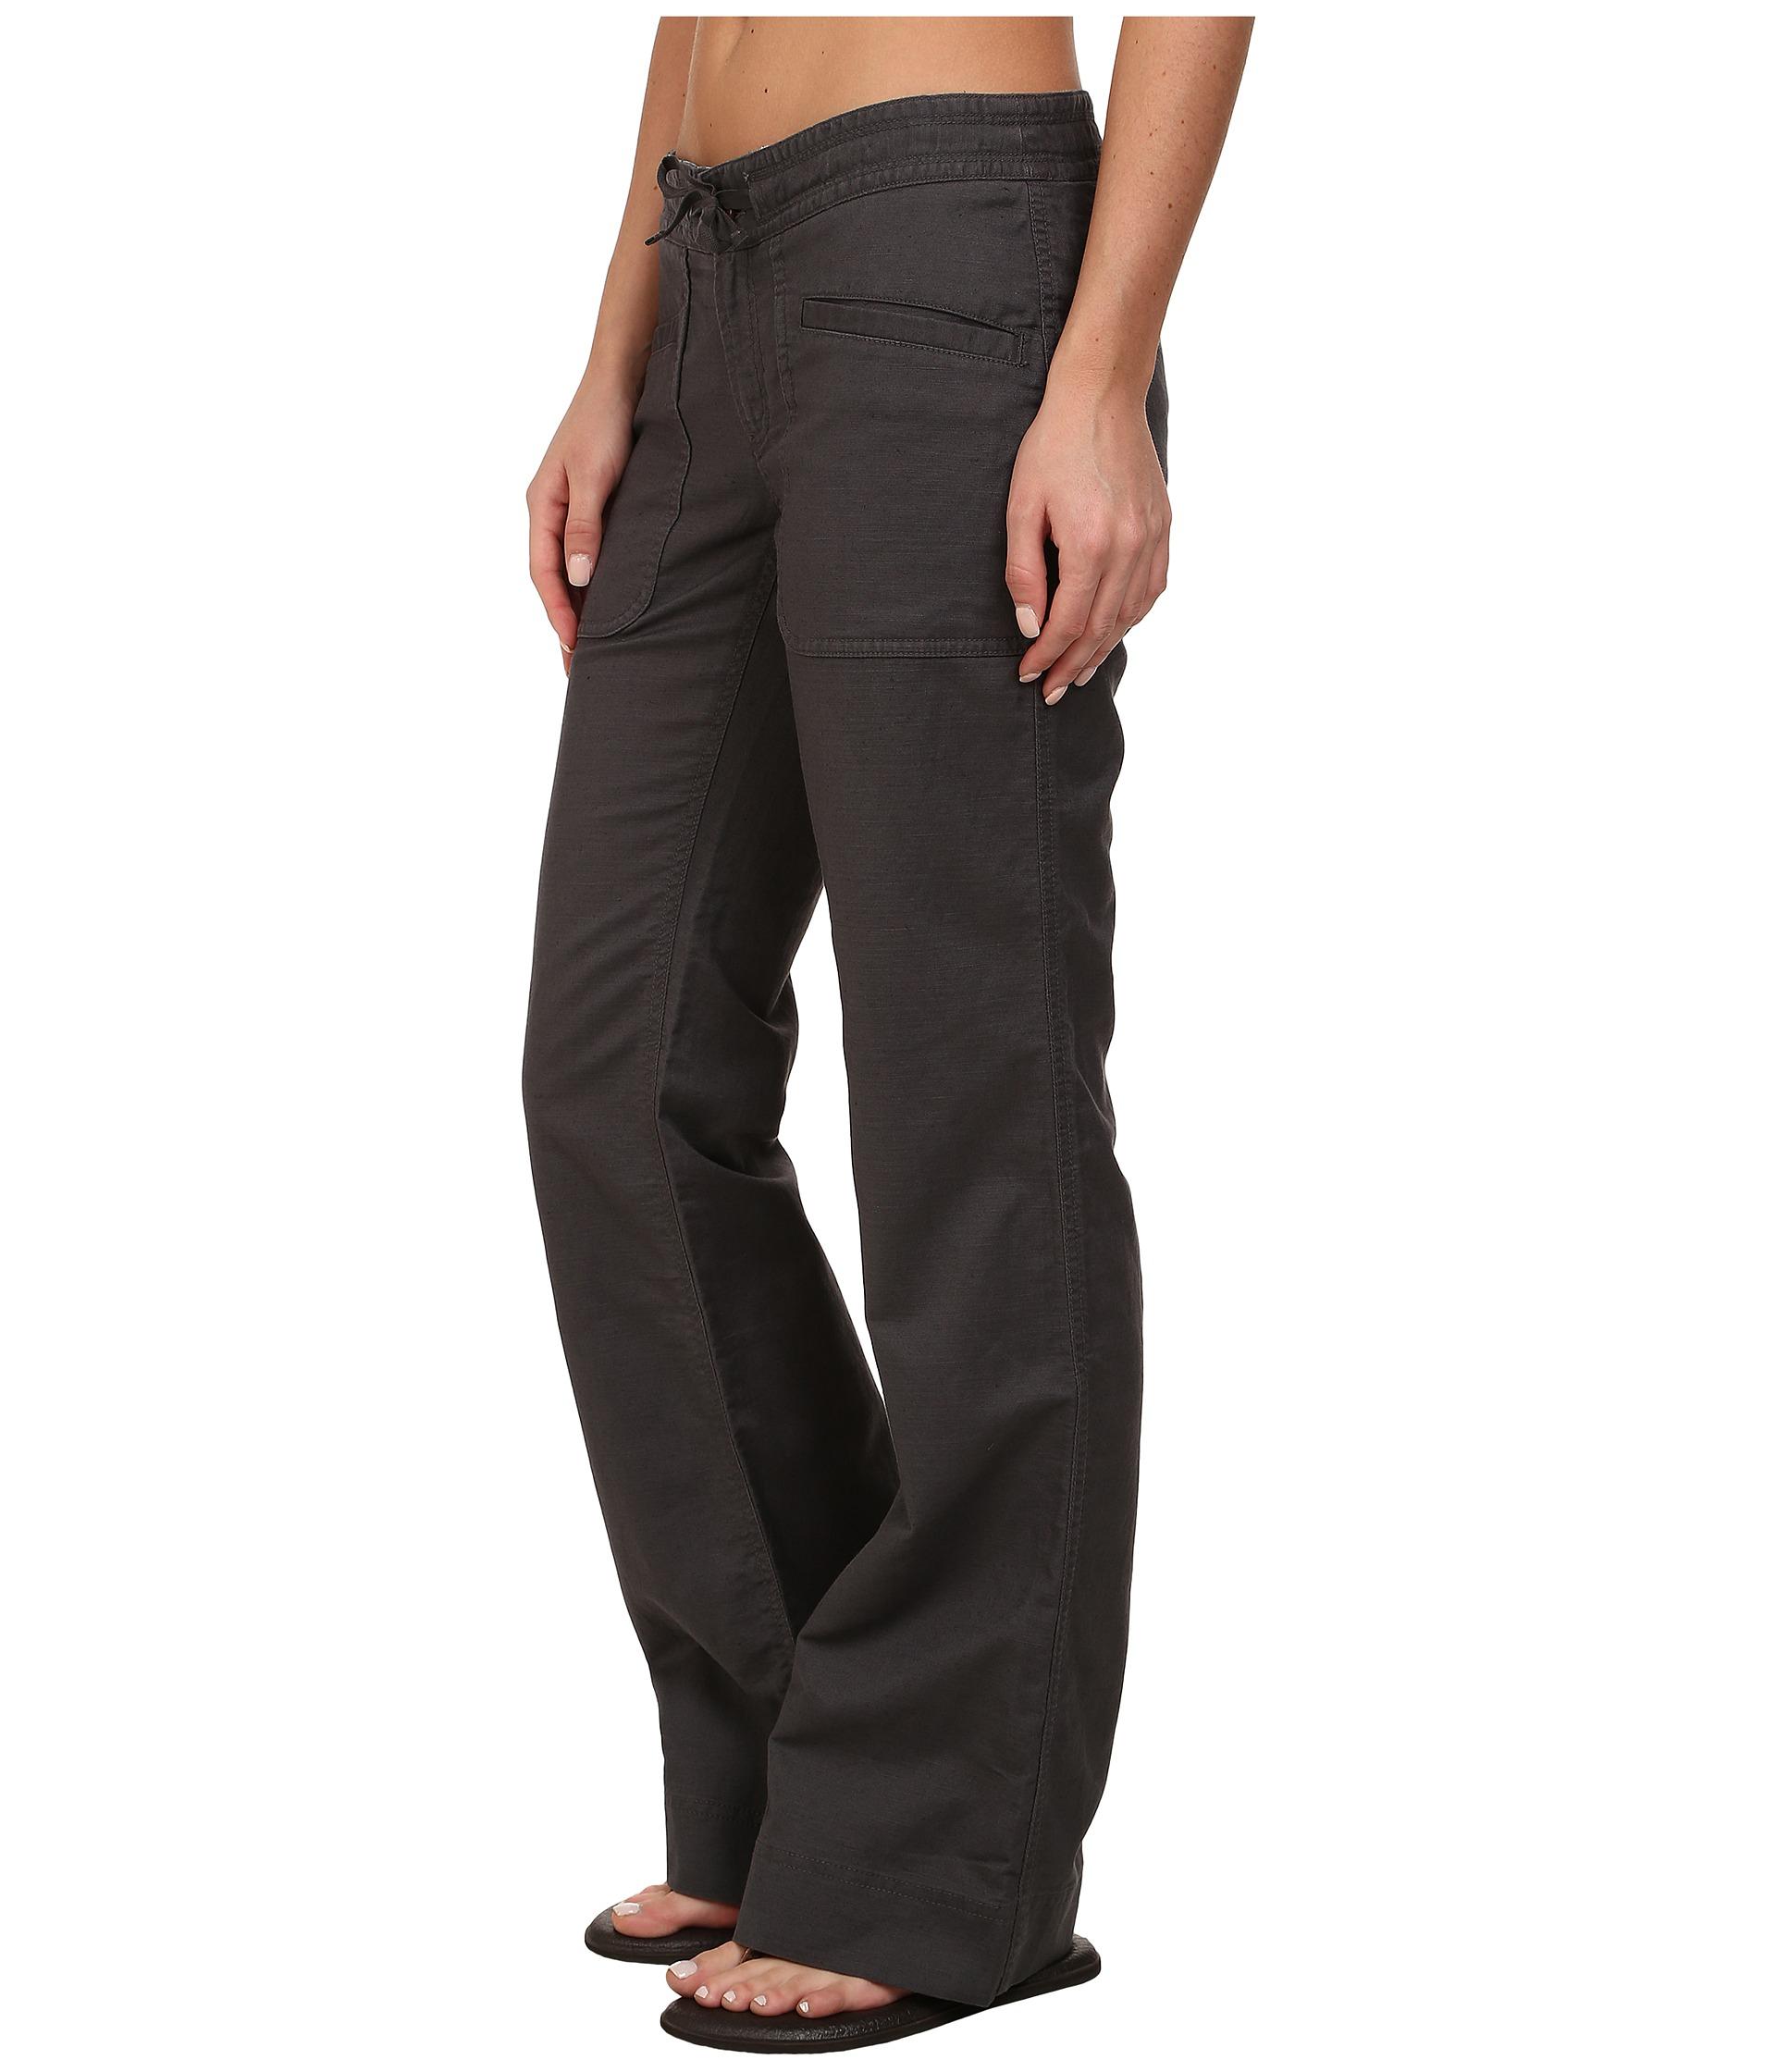 Lastest Grey Linen Pants Women  Fantastic Blue Grey Linen Pants Women Style U2013 Playzoa.com